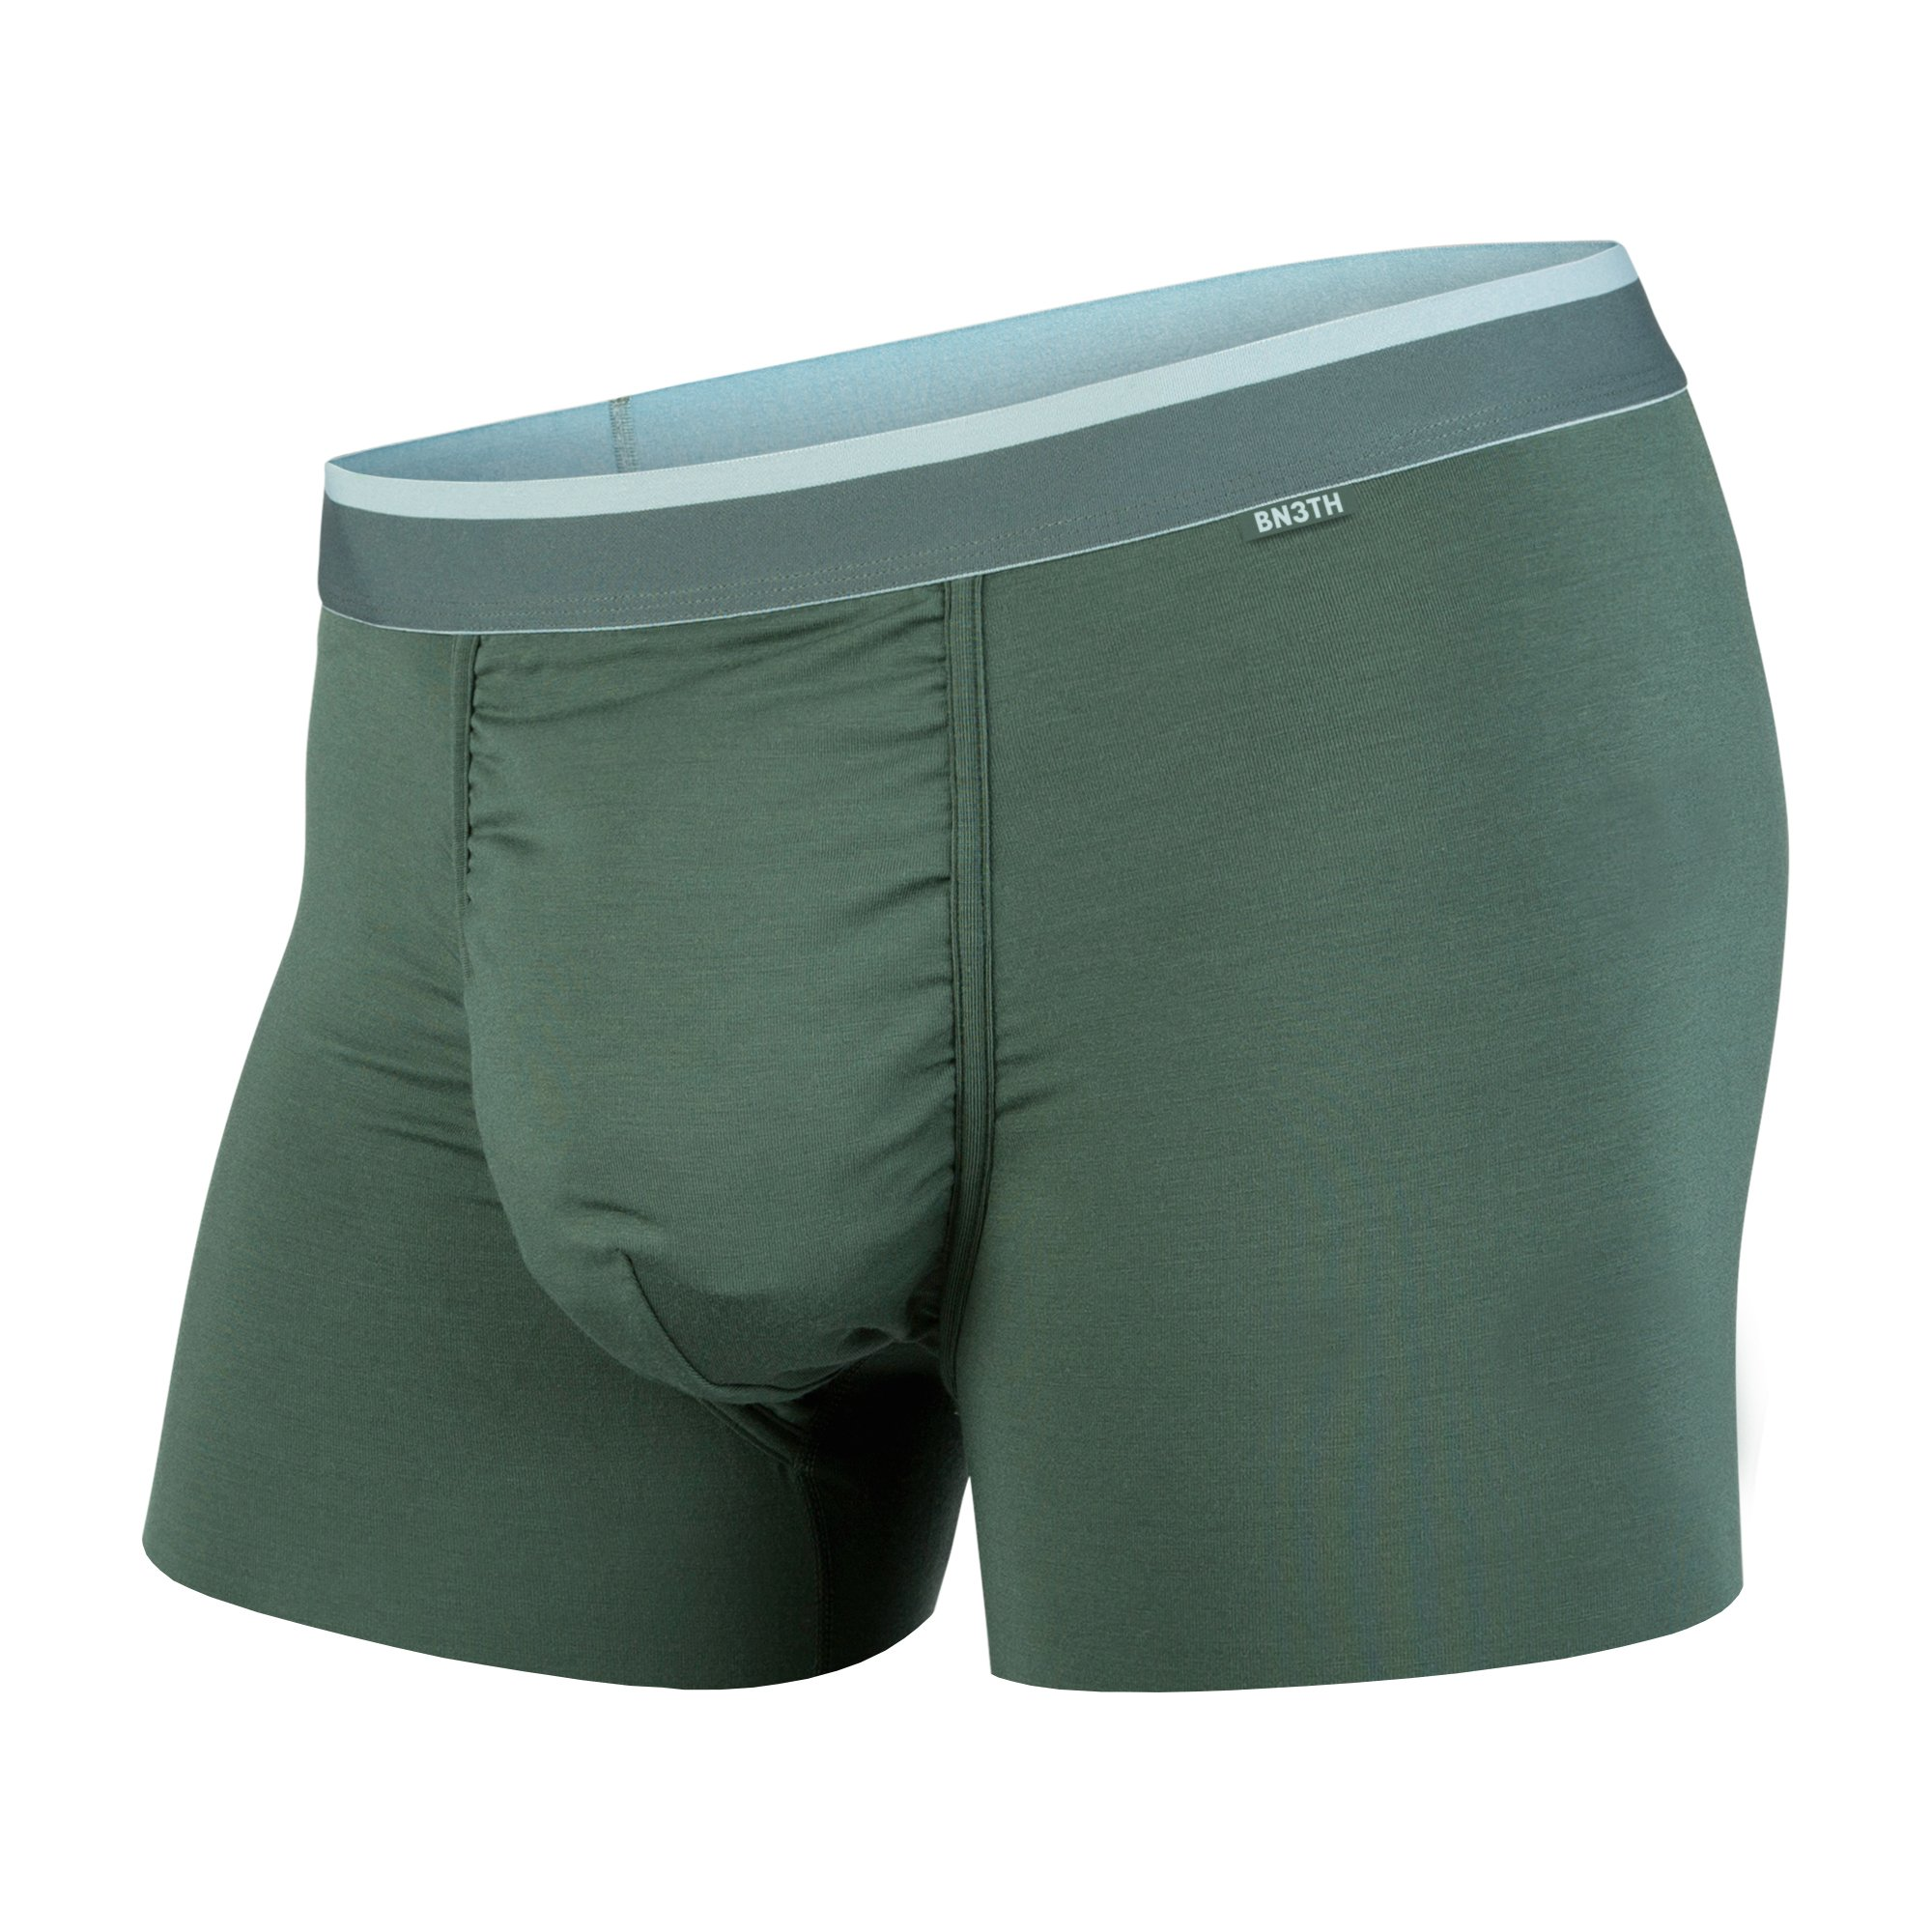 BN3TH Classics Trunk Base Layer Underwear, Medium, Moss/Bluestone